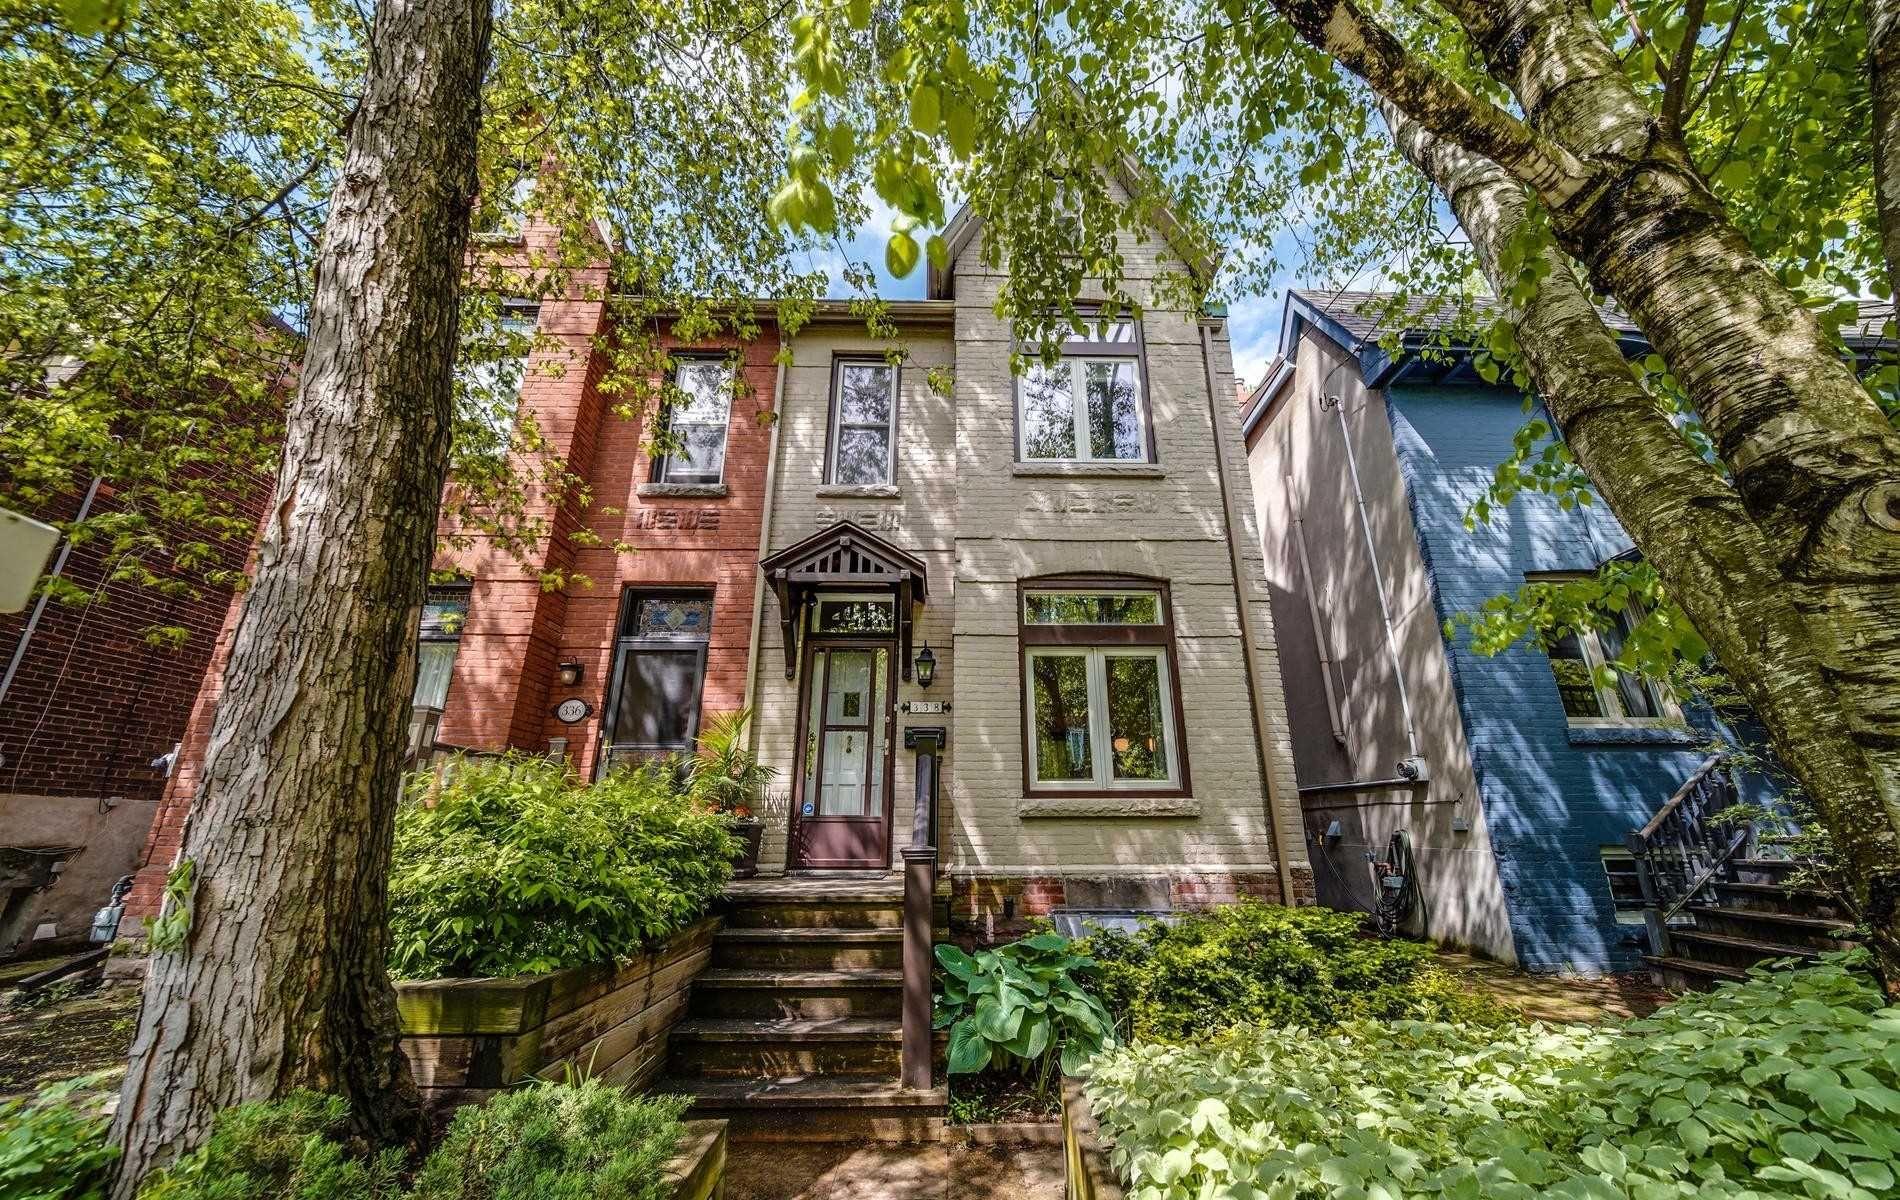 Main Photo: Videos: 338 Logan Avenue in Toronto: South Riverdale House (2 1/2 Storey) for sale (Toronto E01)  : MLS®# E4480515